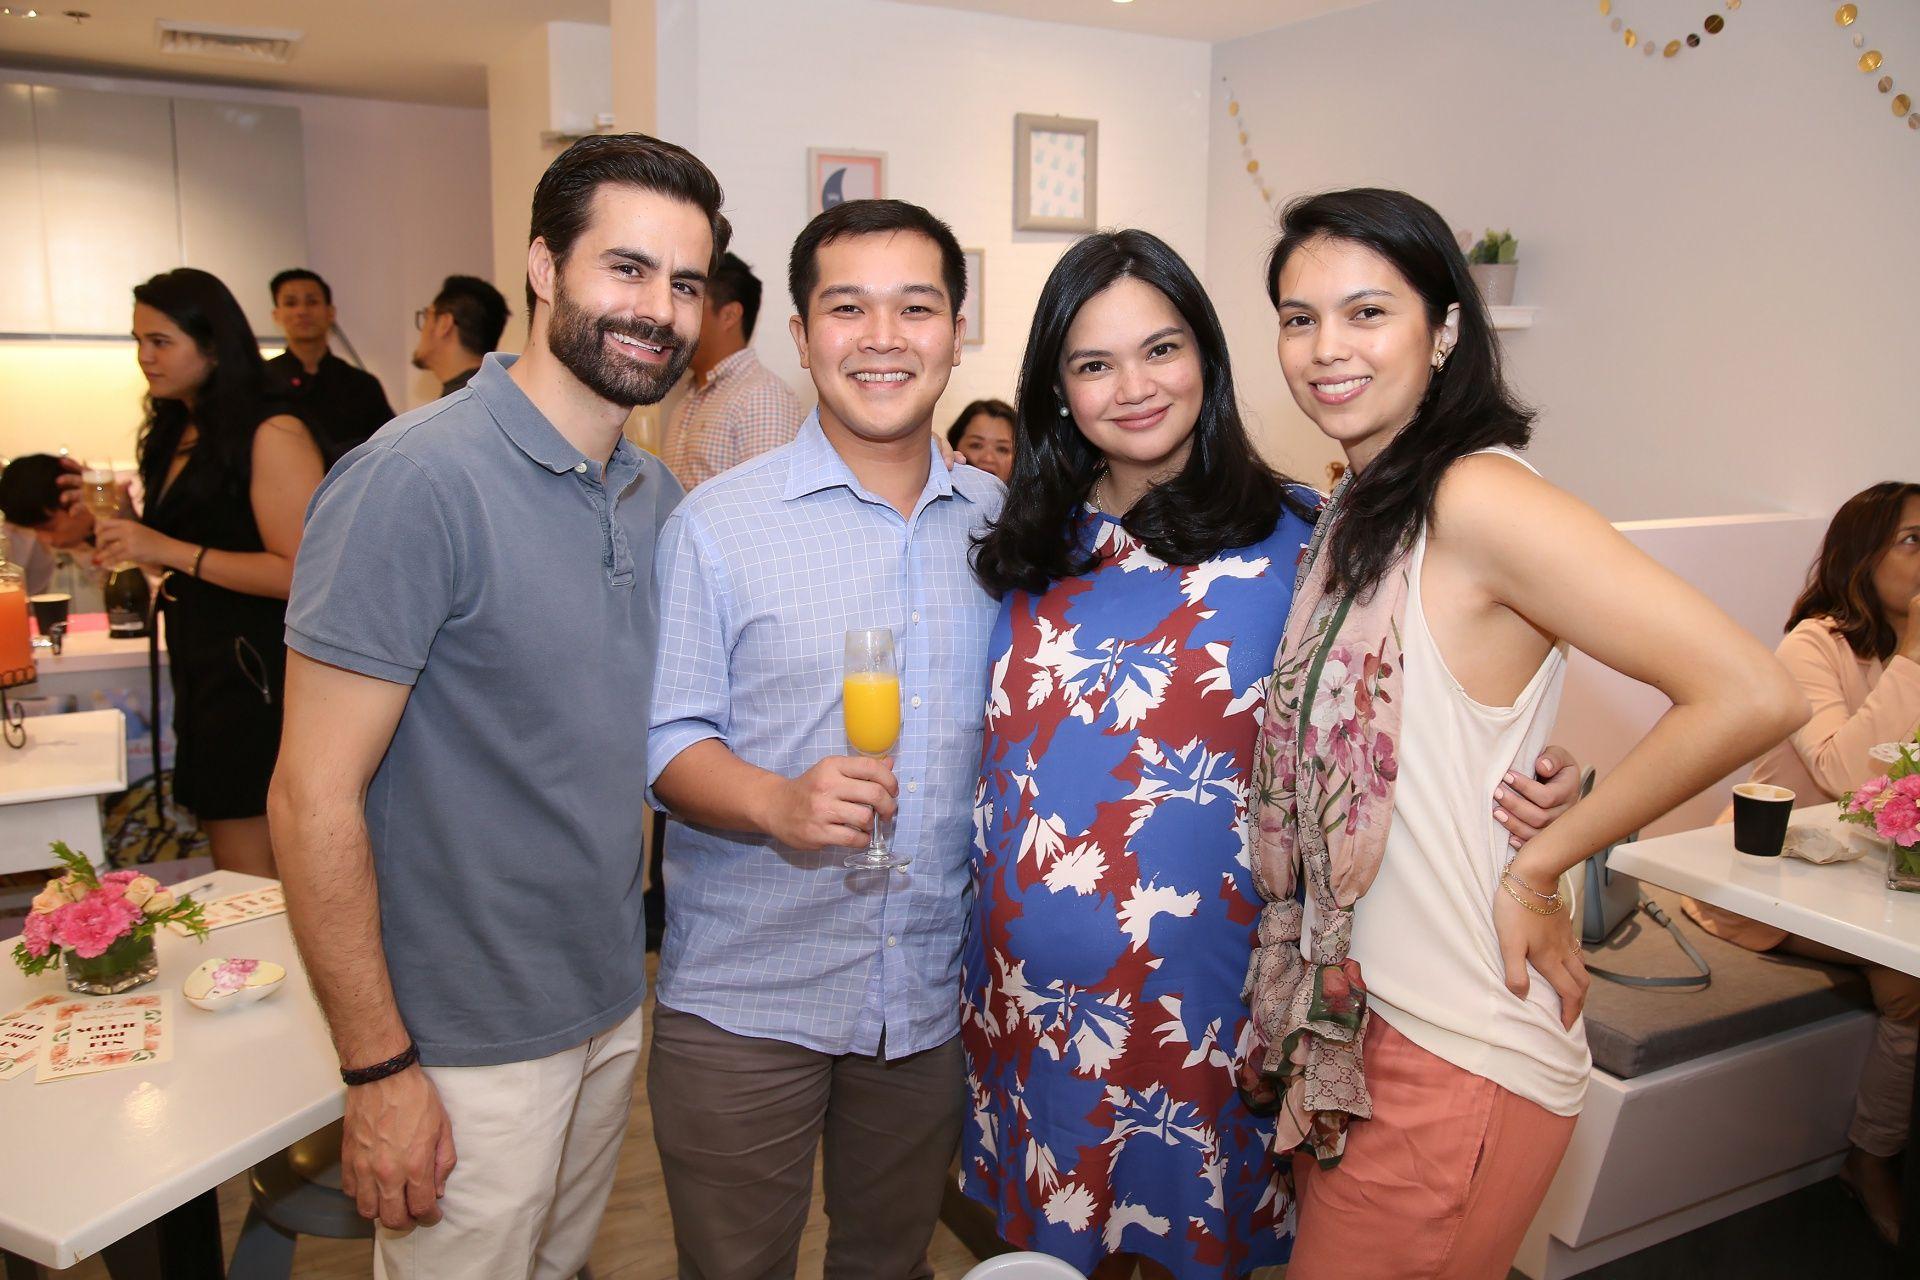 Isra Albert, Ken Solon, Sophie Villanueva Solon, Monica Villanueva Albert